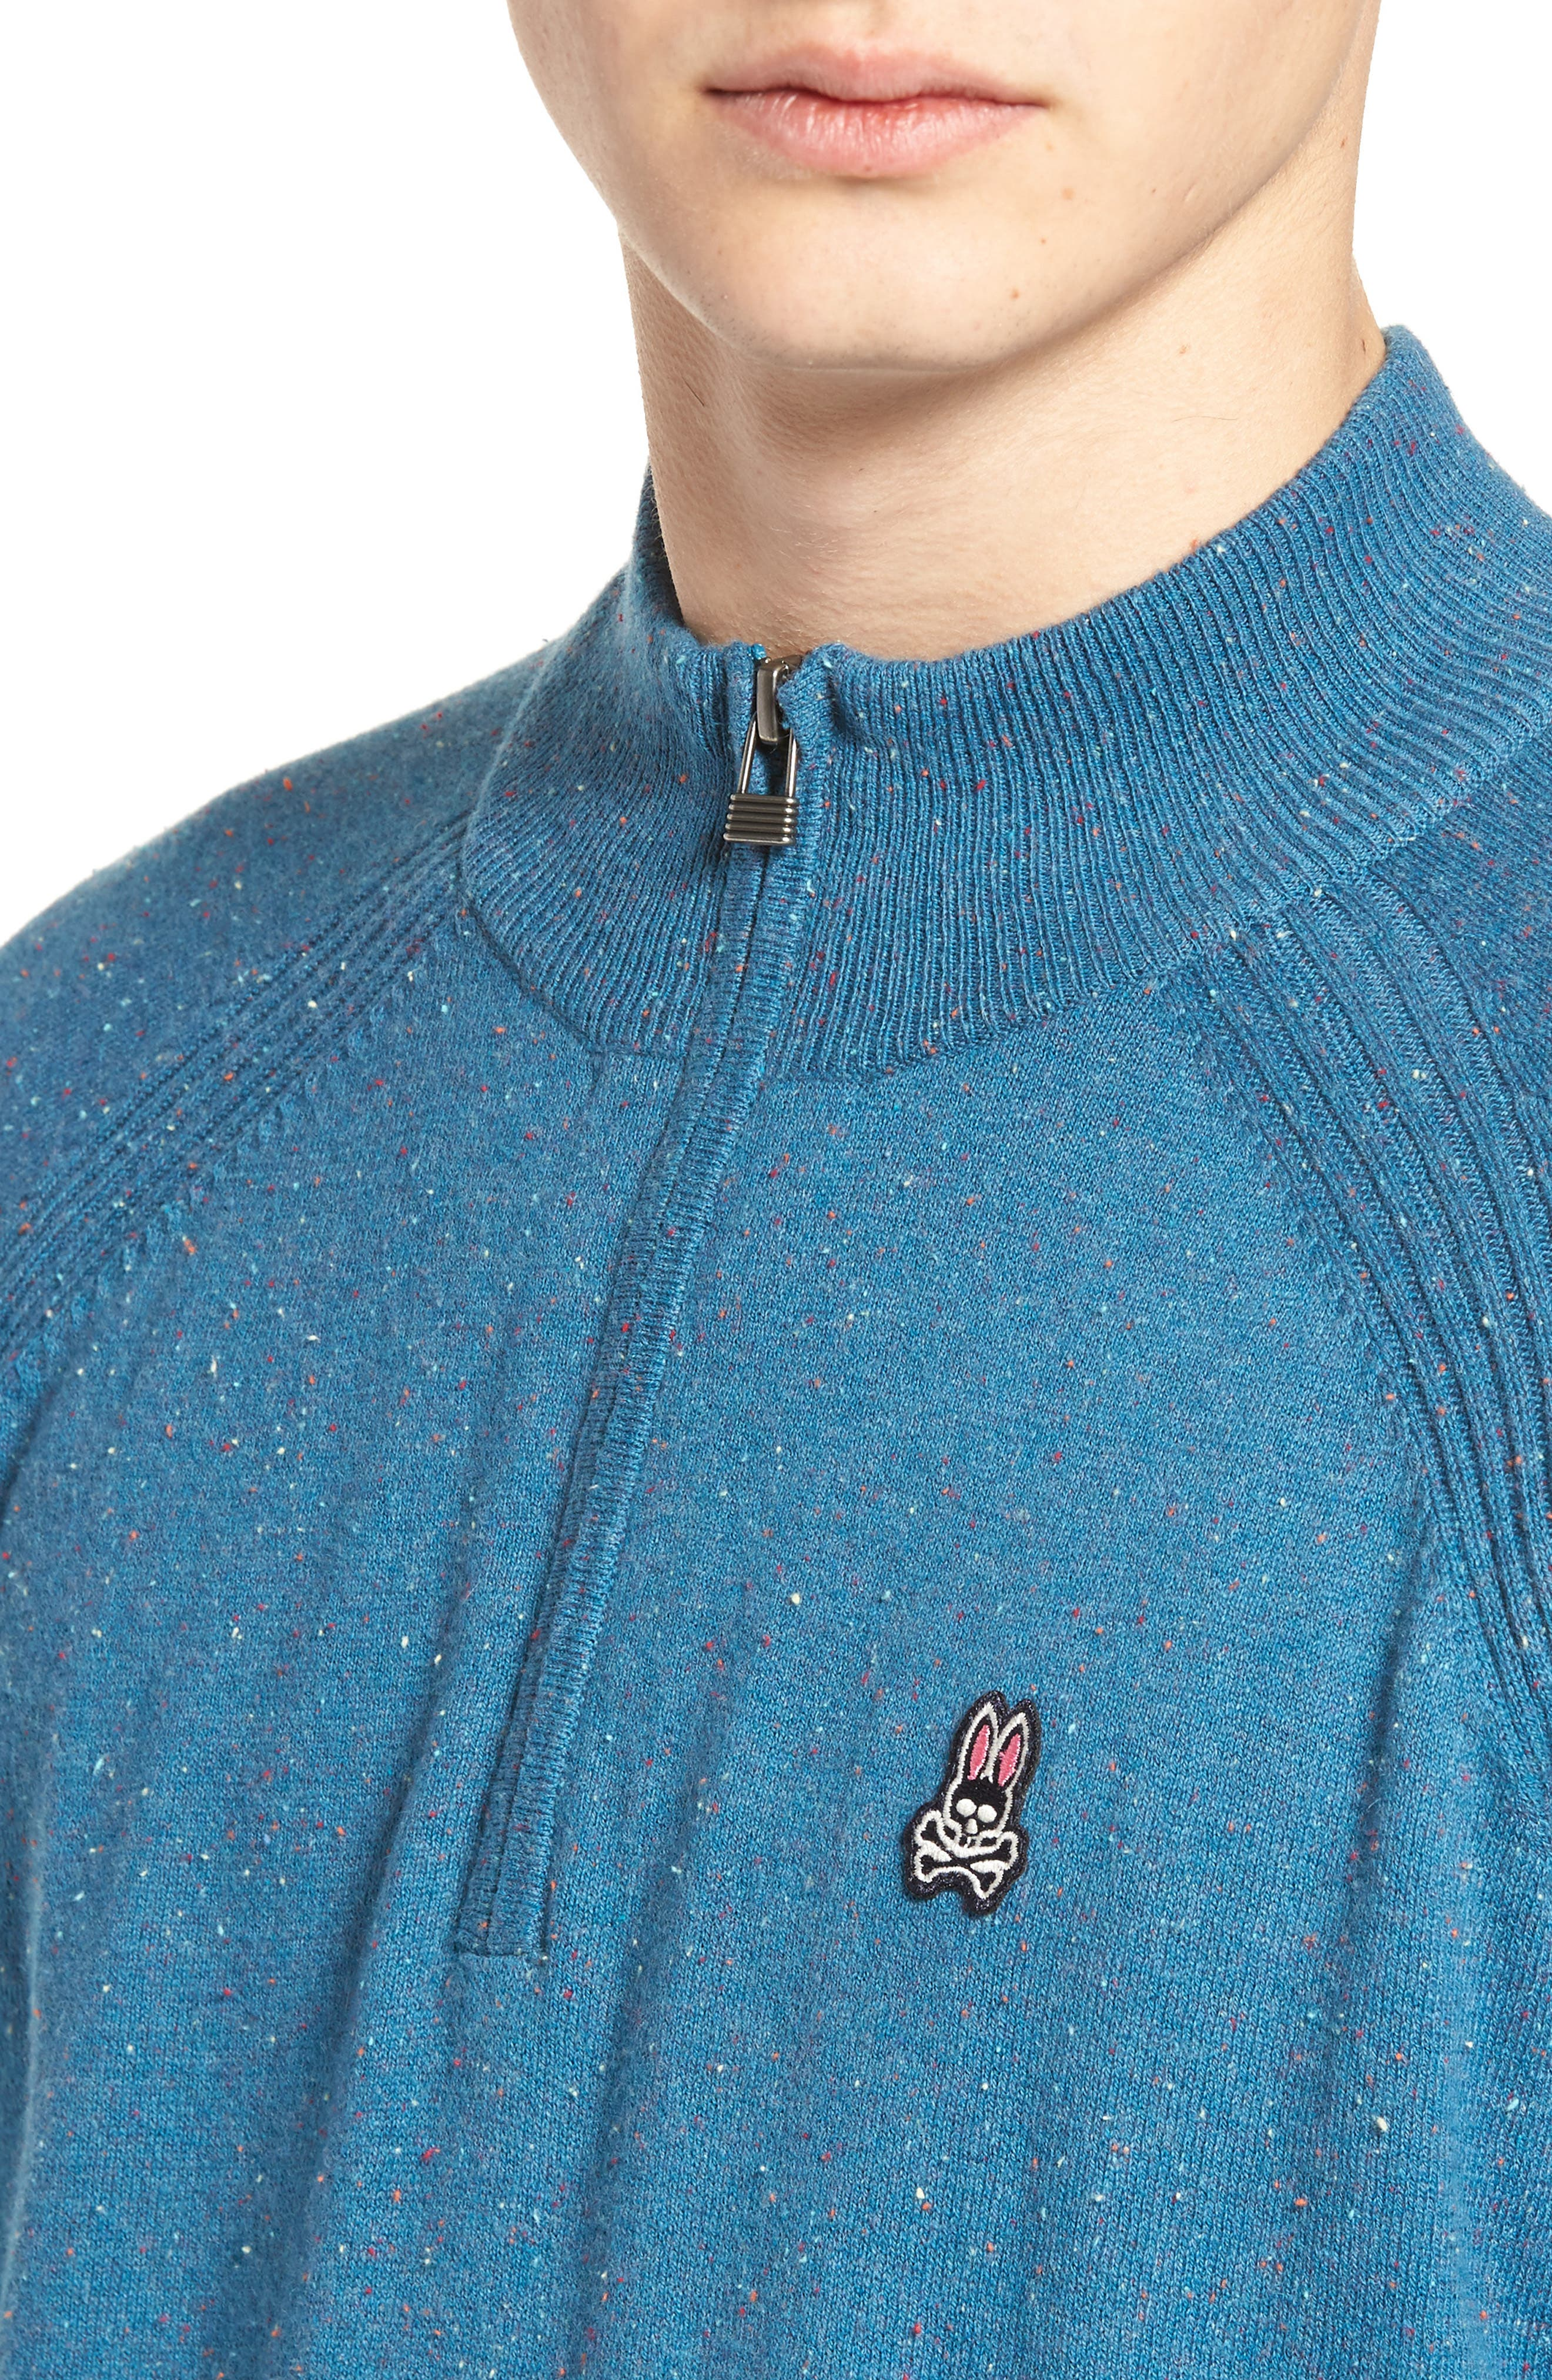 Donegal Quarter Zip Pullover,                             Alternate thumbnail 4, color,                             445